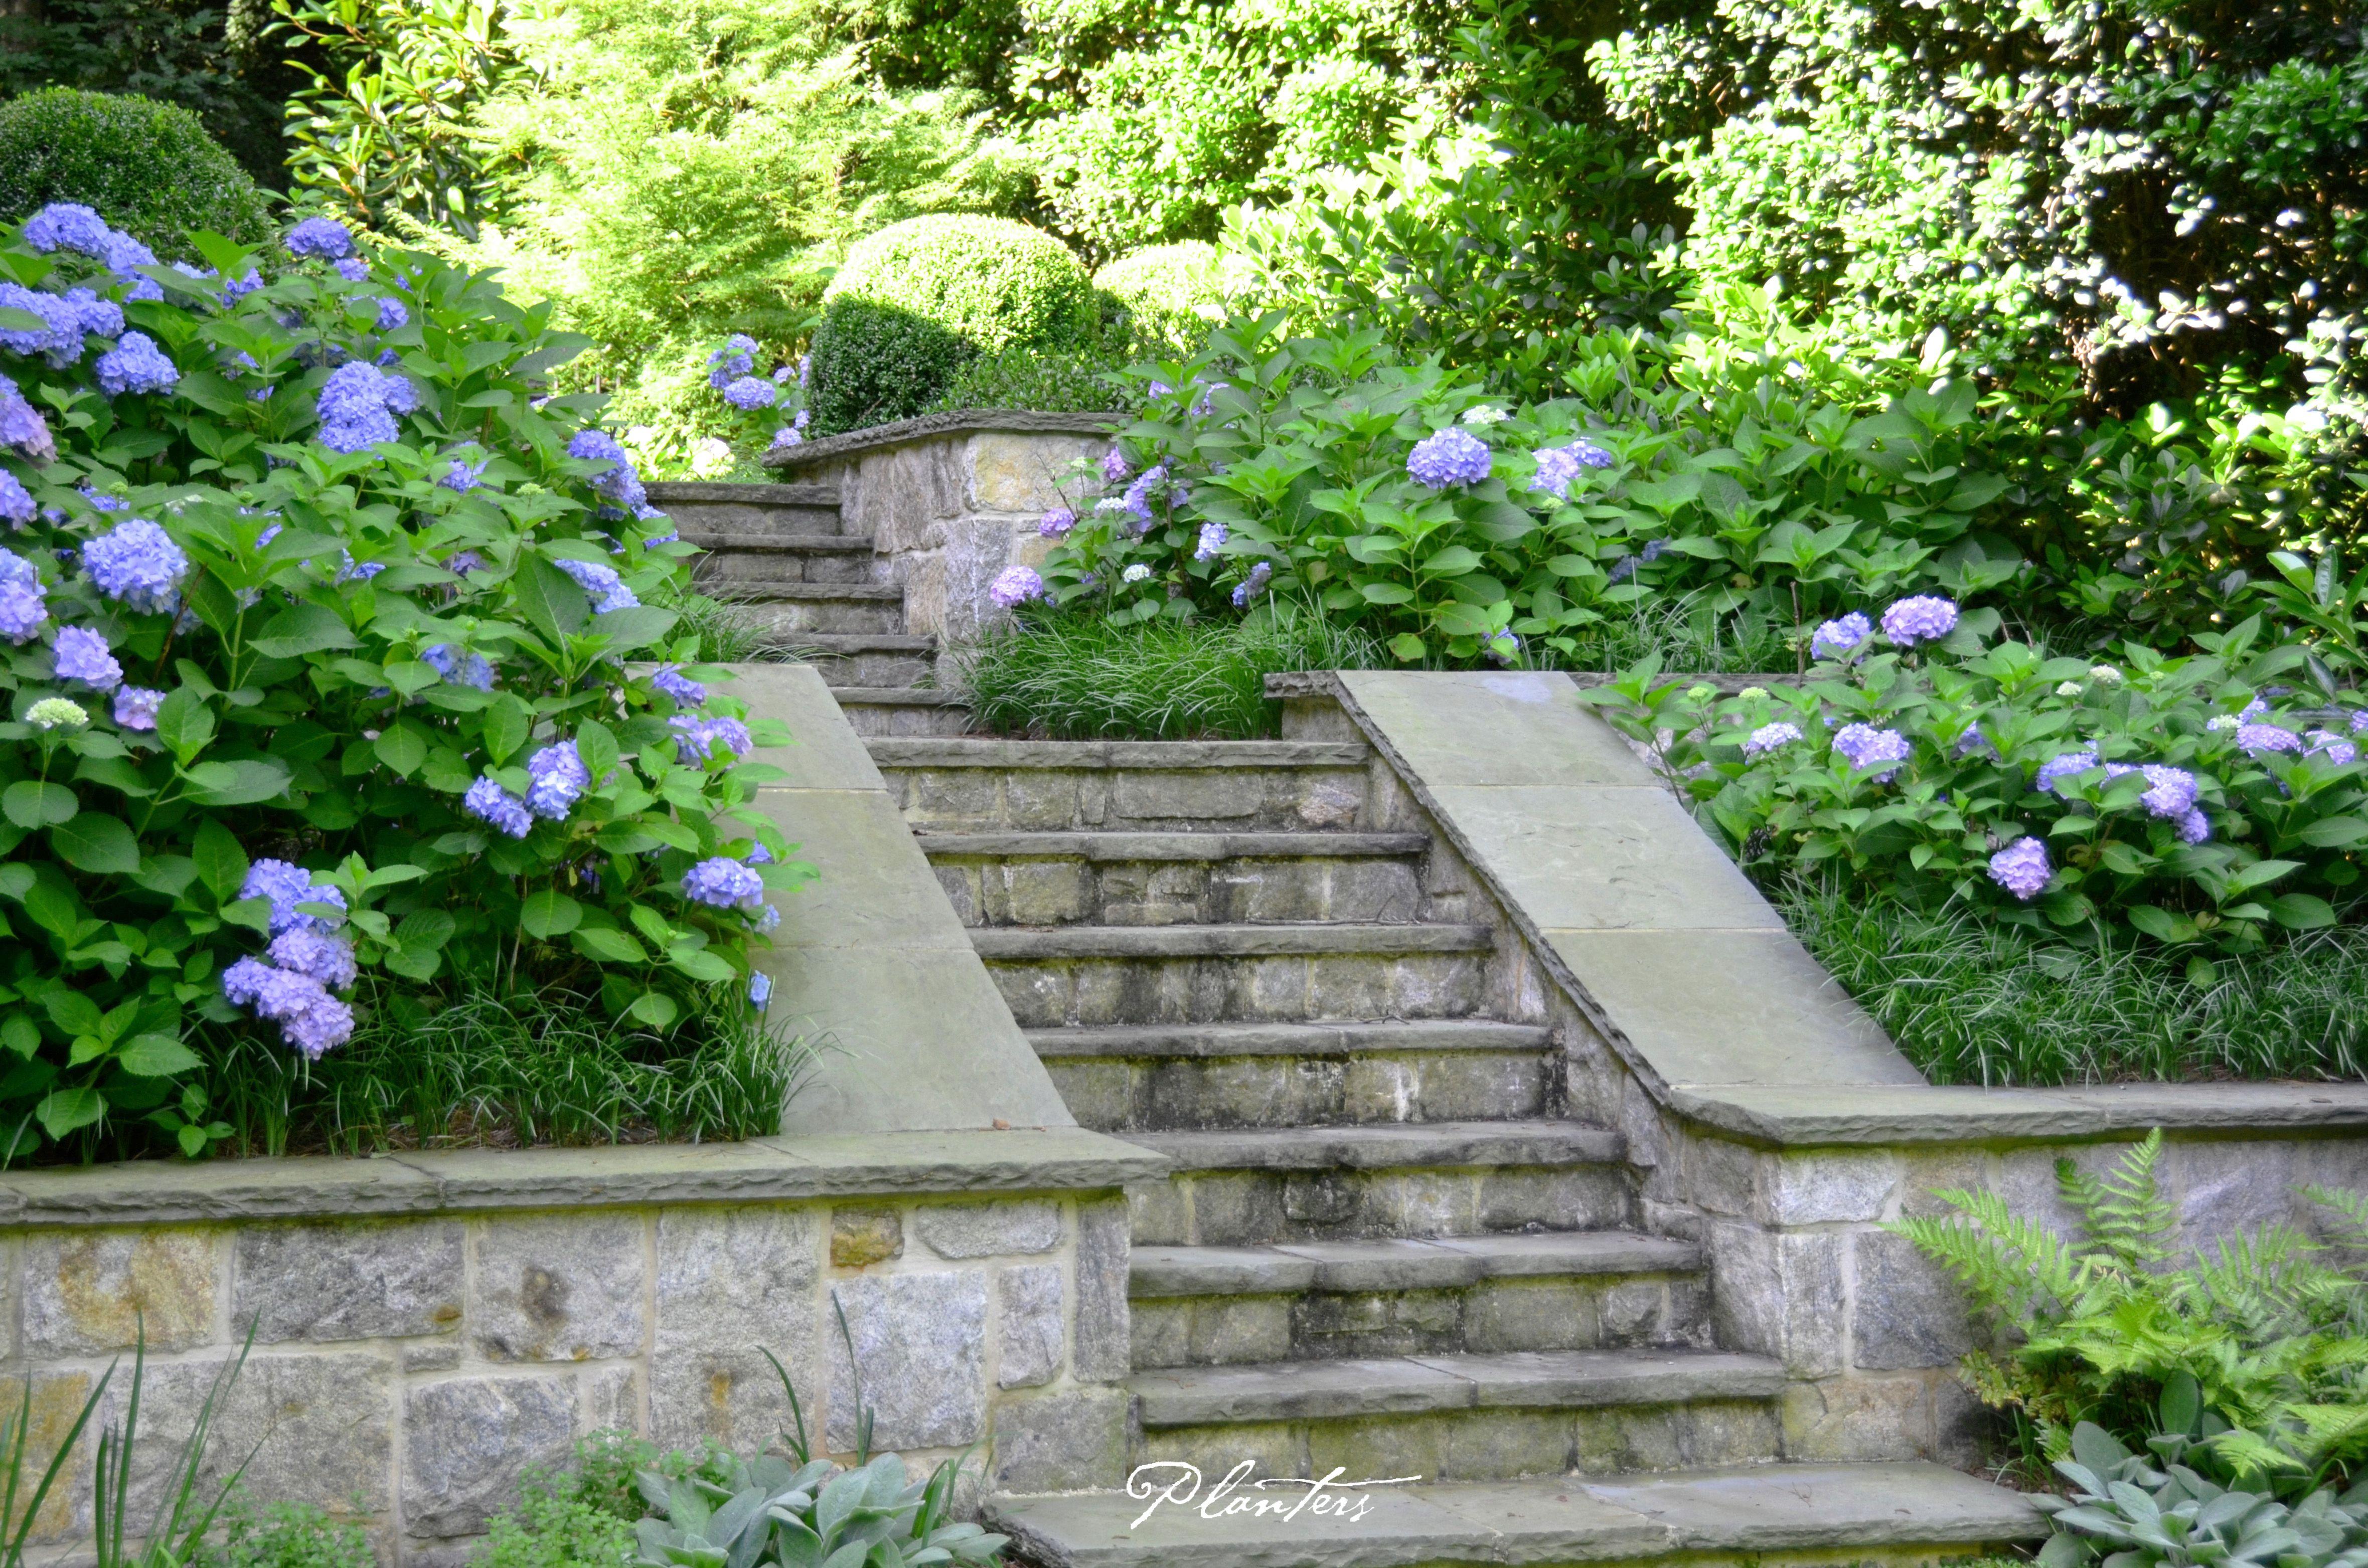 Landscape architect atlanta ga - Blue Endless Summer Hydrangeas Line This Stairway A Planters Design Atlanta Ga